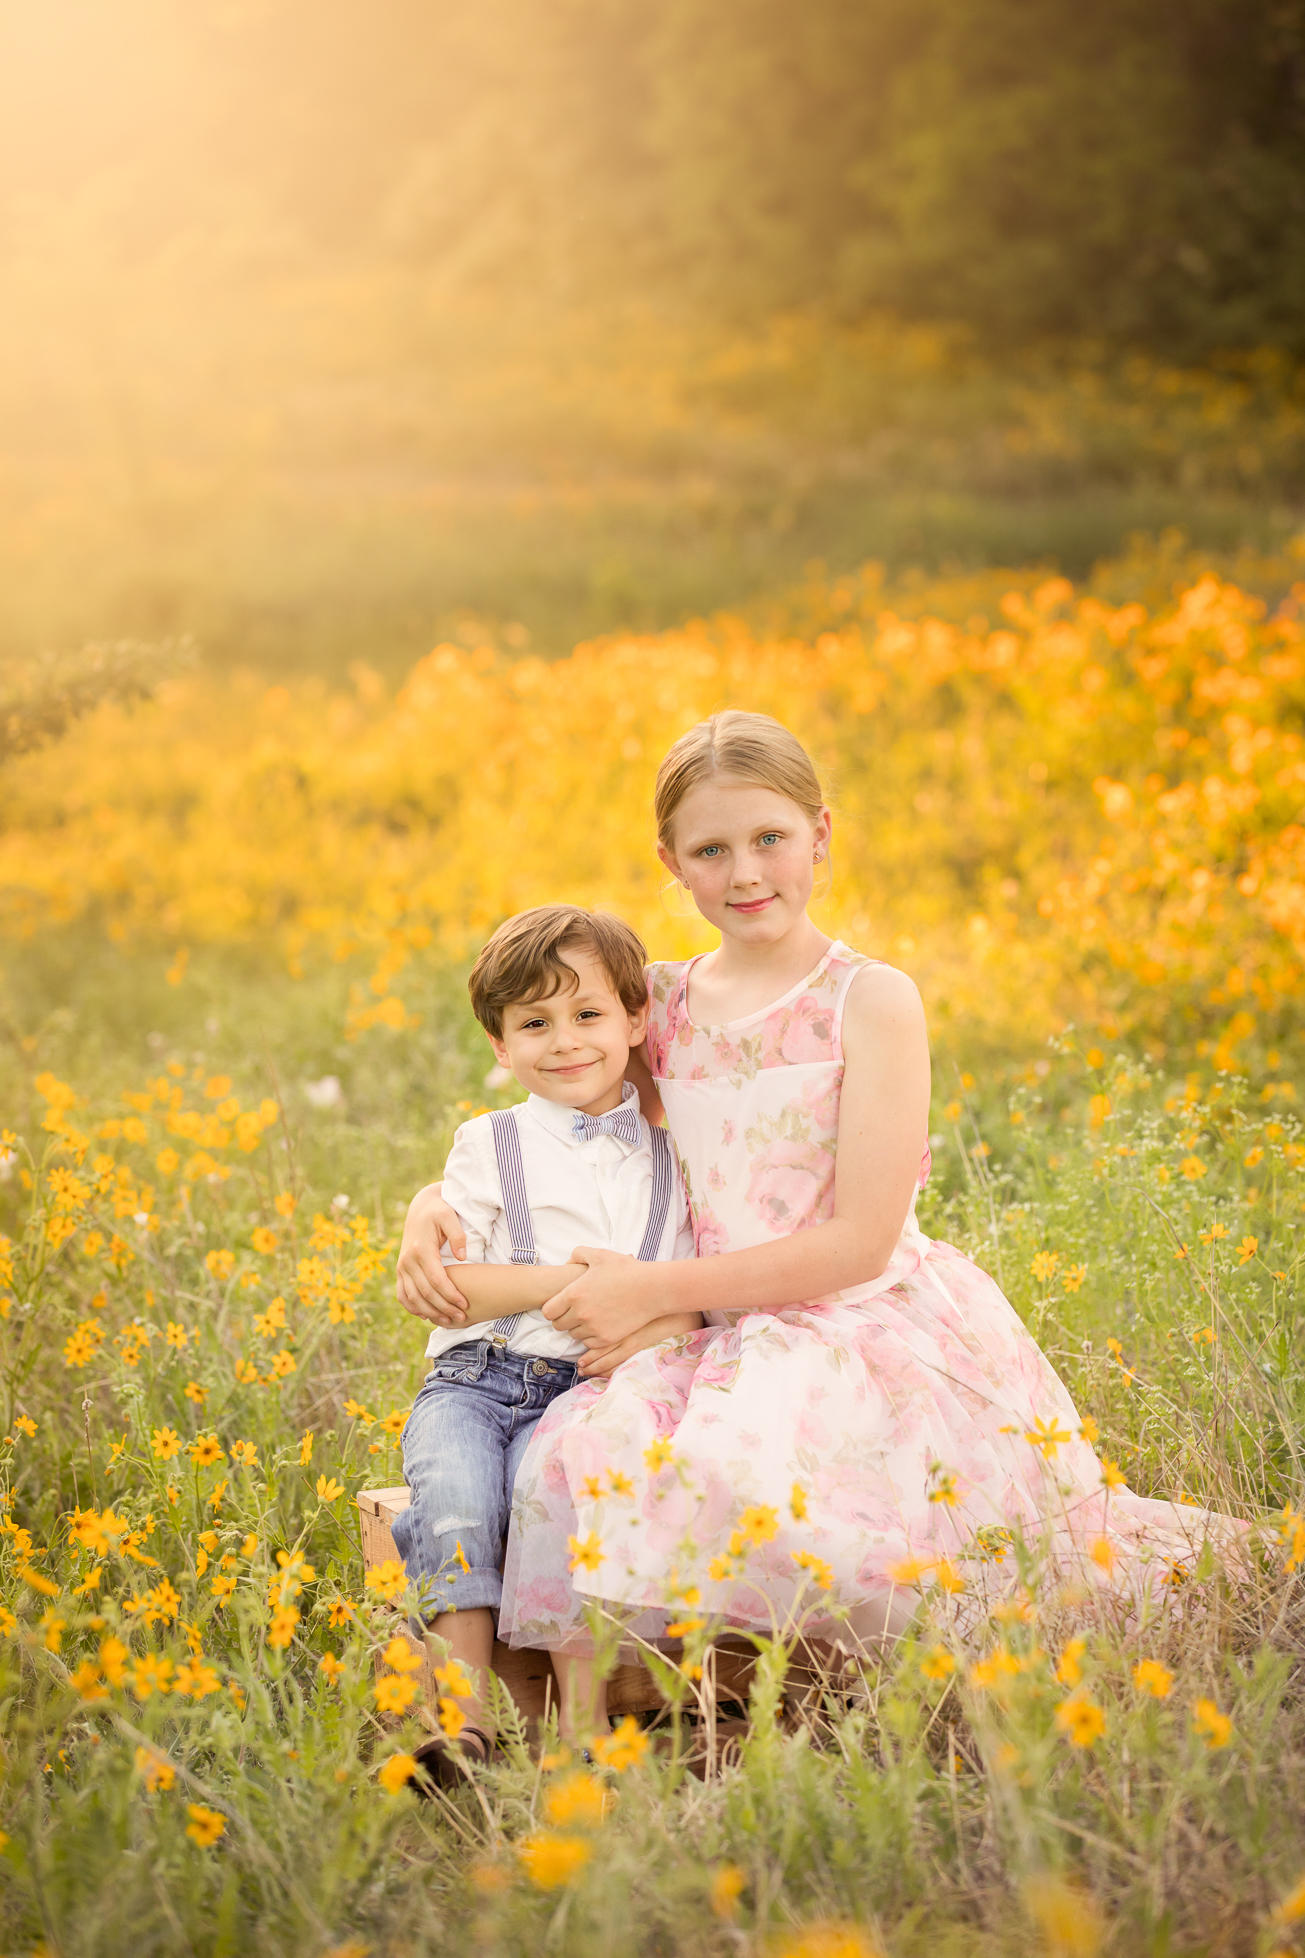 Fort Worth Children's Photographer